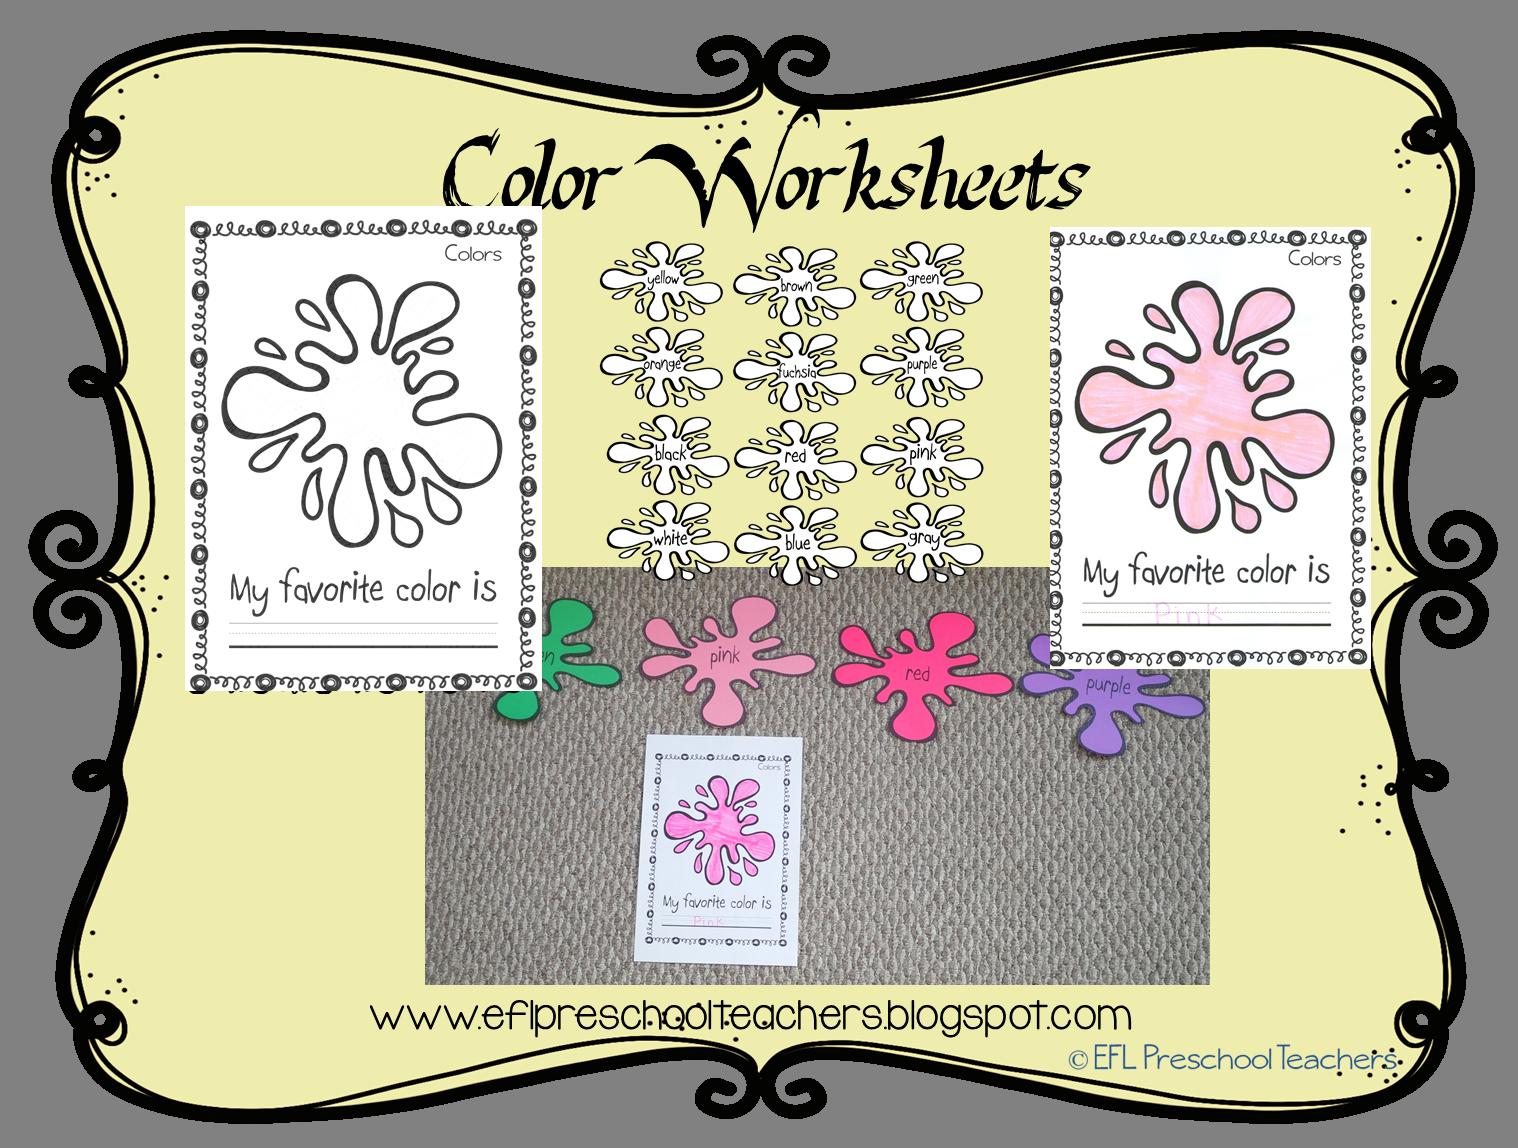 Esl Color Unit Worksheet My Favorite Color And Then Amke A Graph Color Worksheets Worksheets Esl Teaching [ 1148 x 1518 Pixel ]